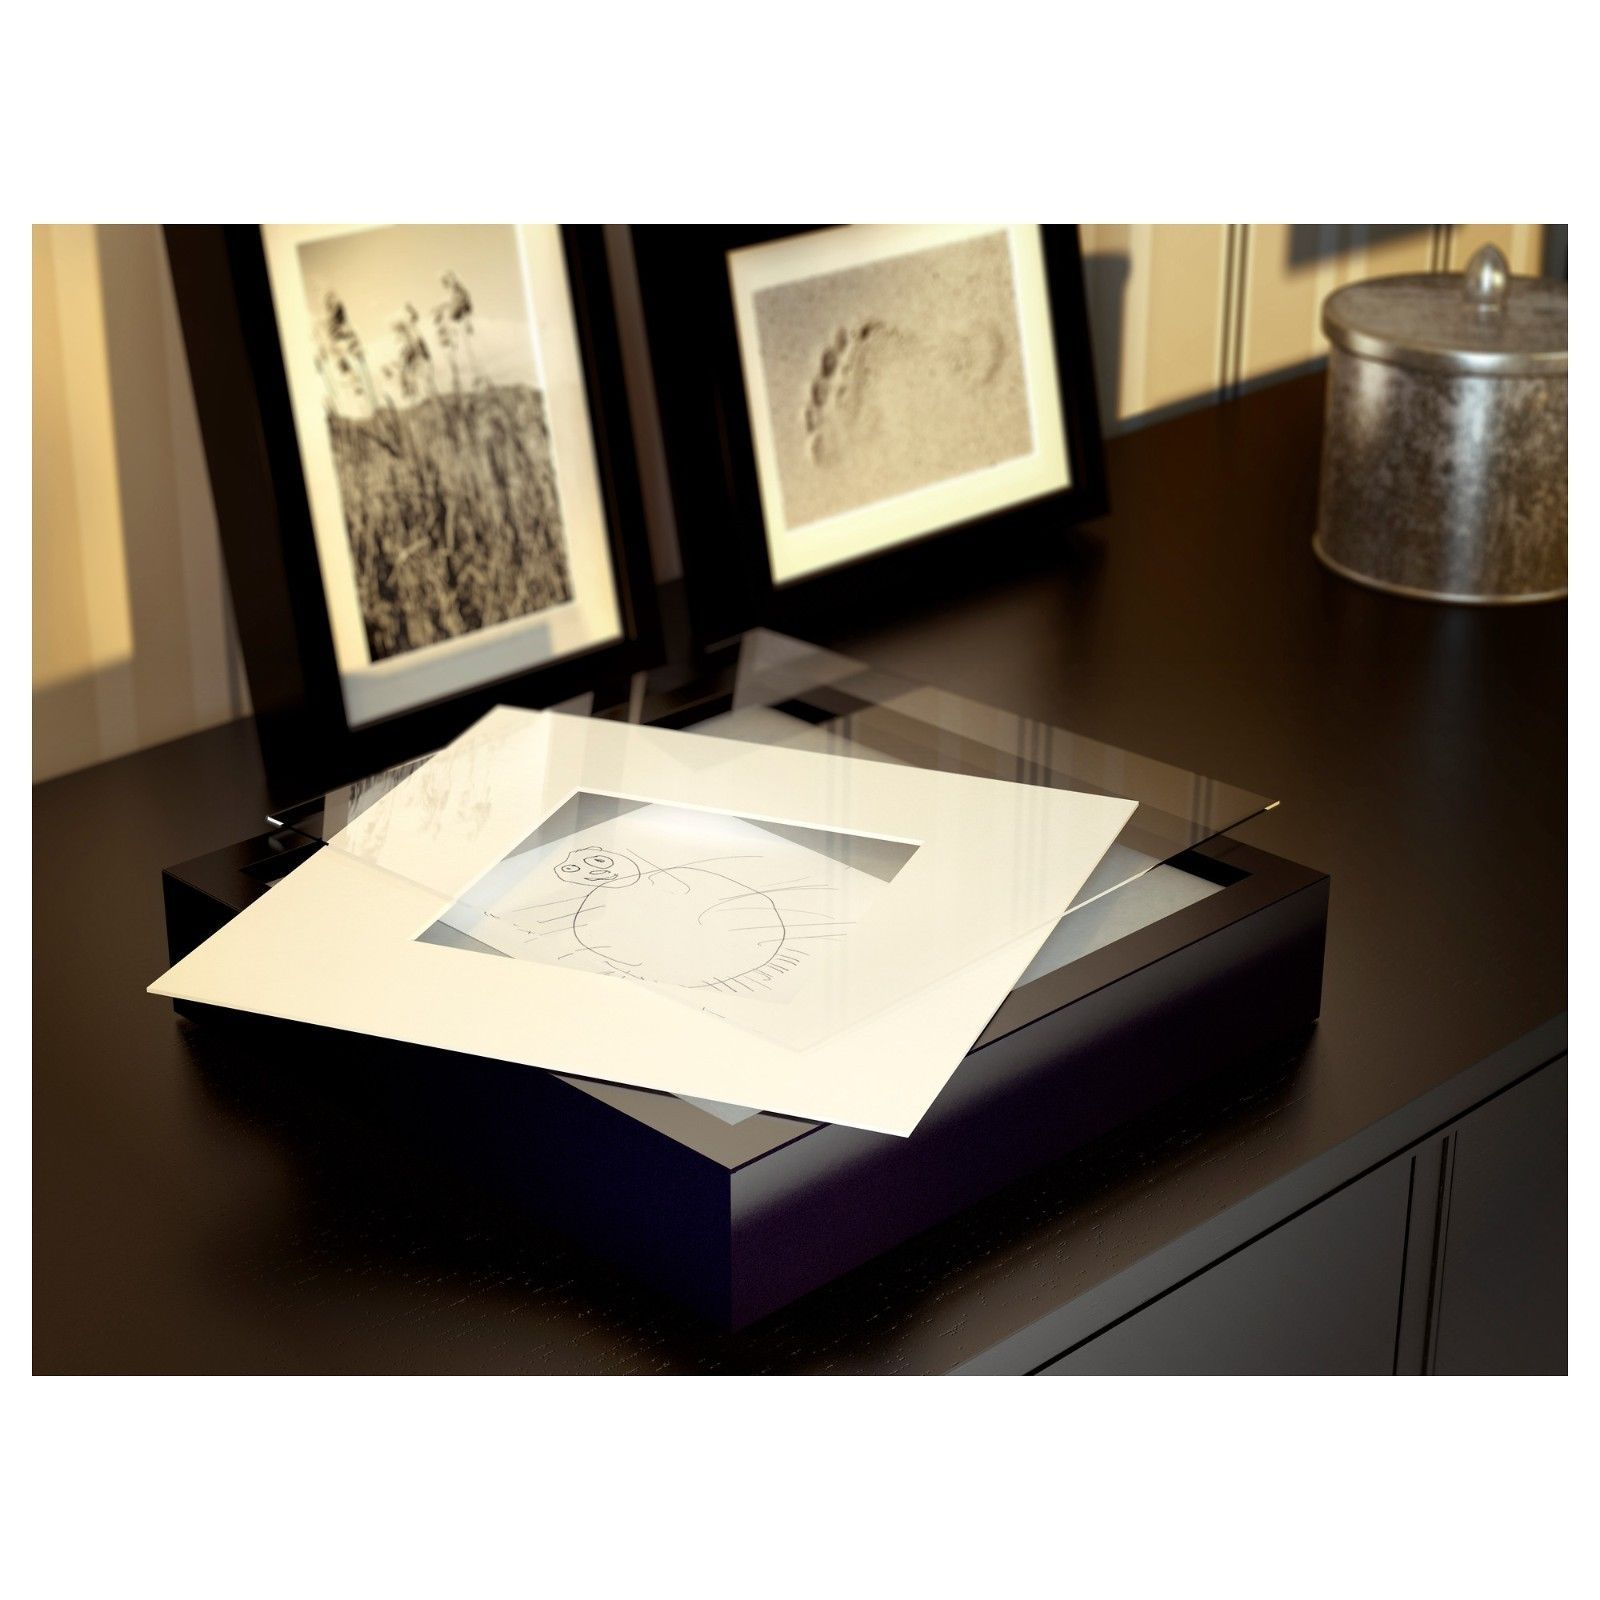 details zu ikea bilderrahmen ribba passepartout rahmen 23x23cm f r 13x13 cm bilder neu. Black Bedroom Furniture Sets. Home Design Ideas